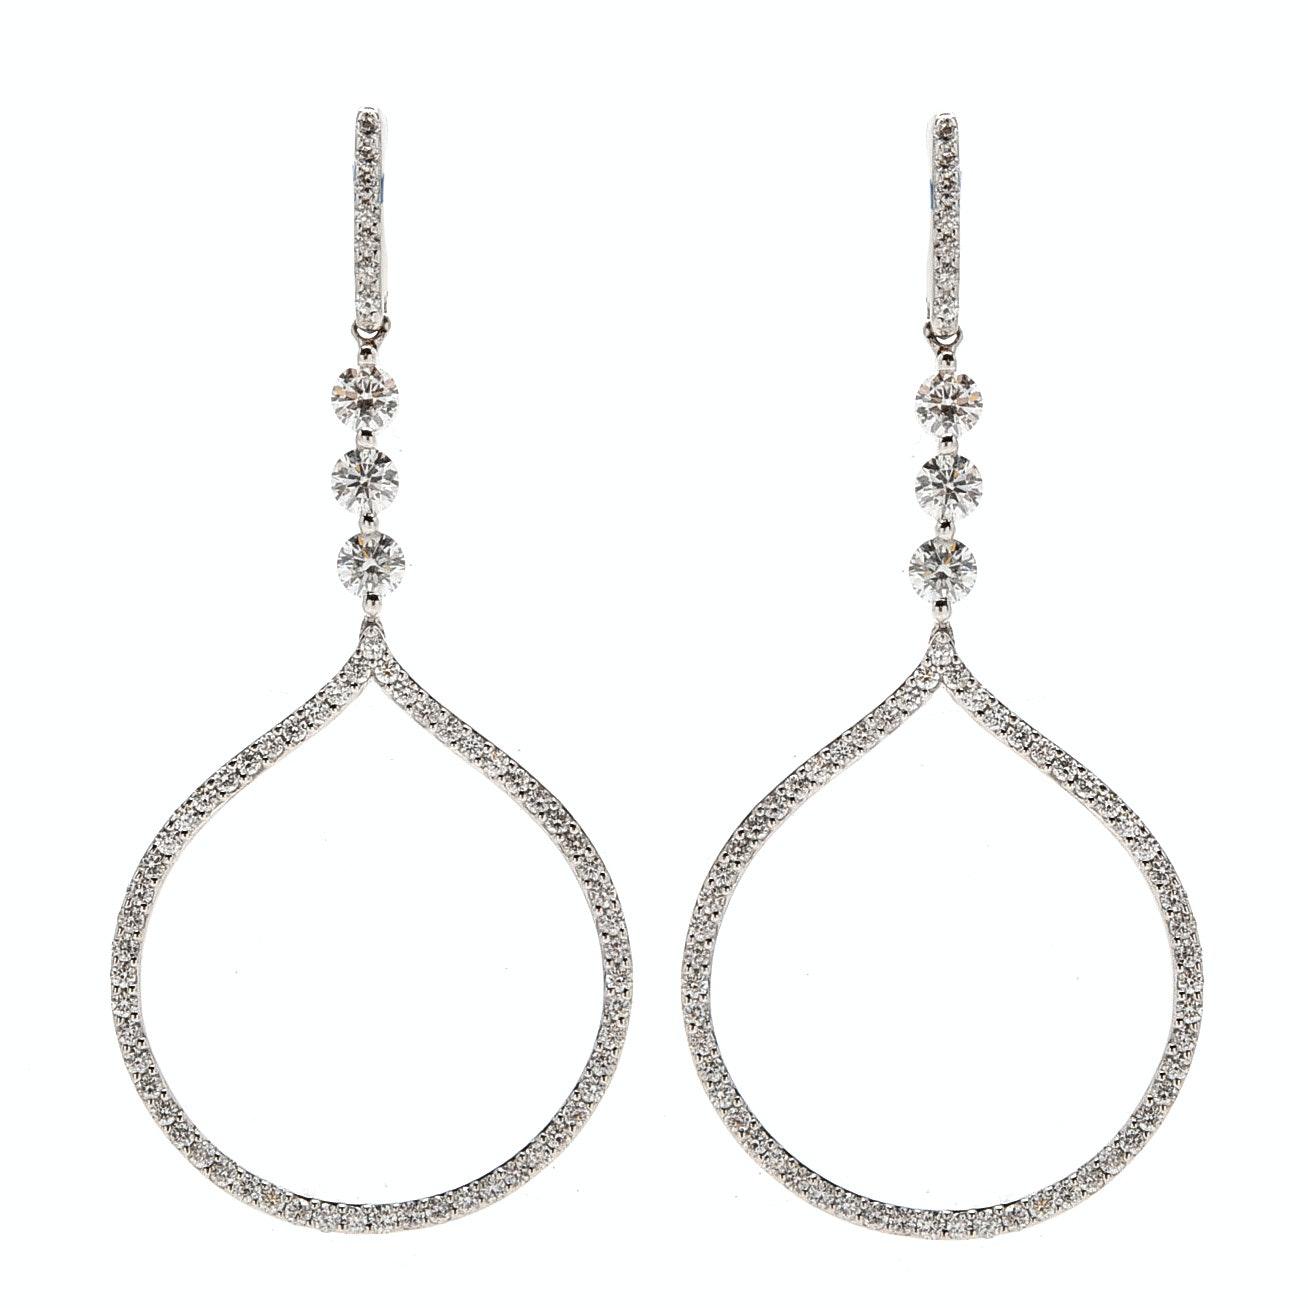 18K White Gold 1.08 CTW Diamond Drop Earrings